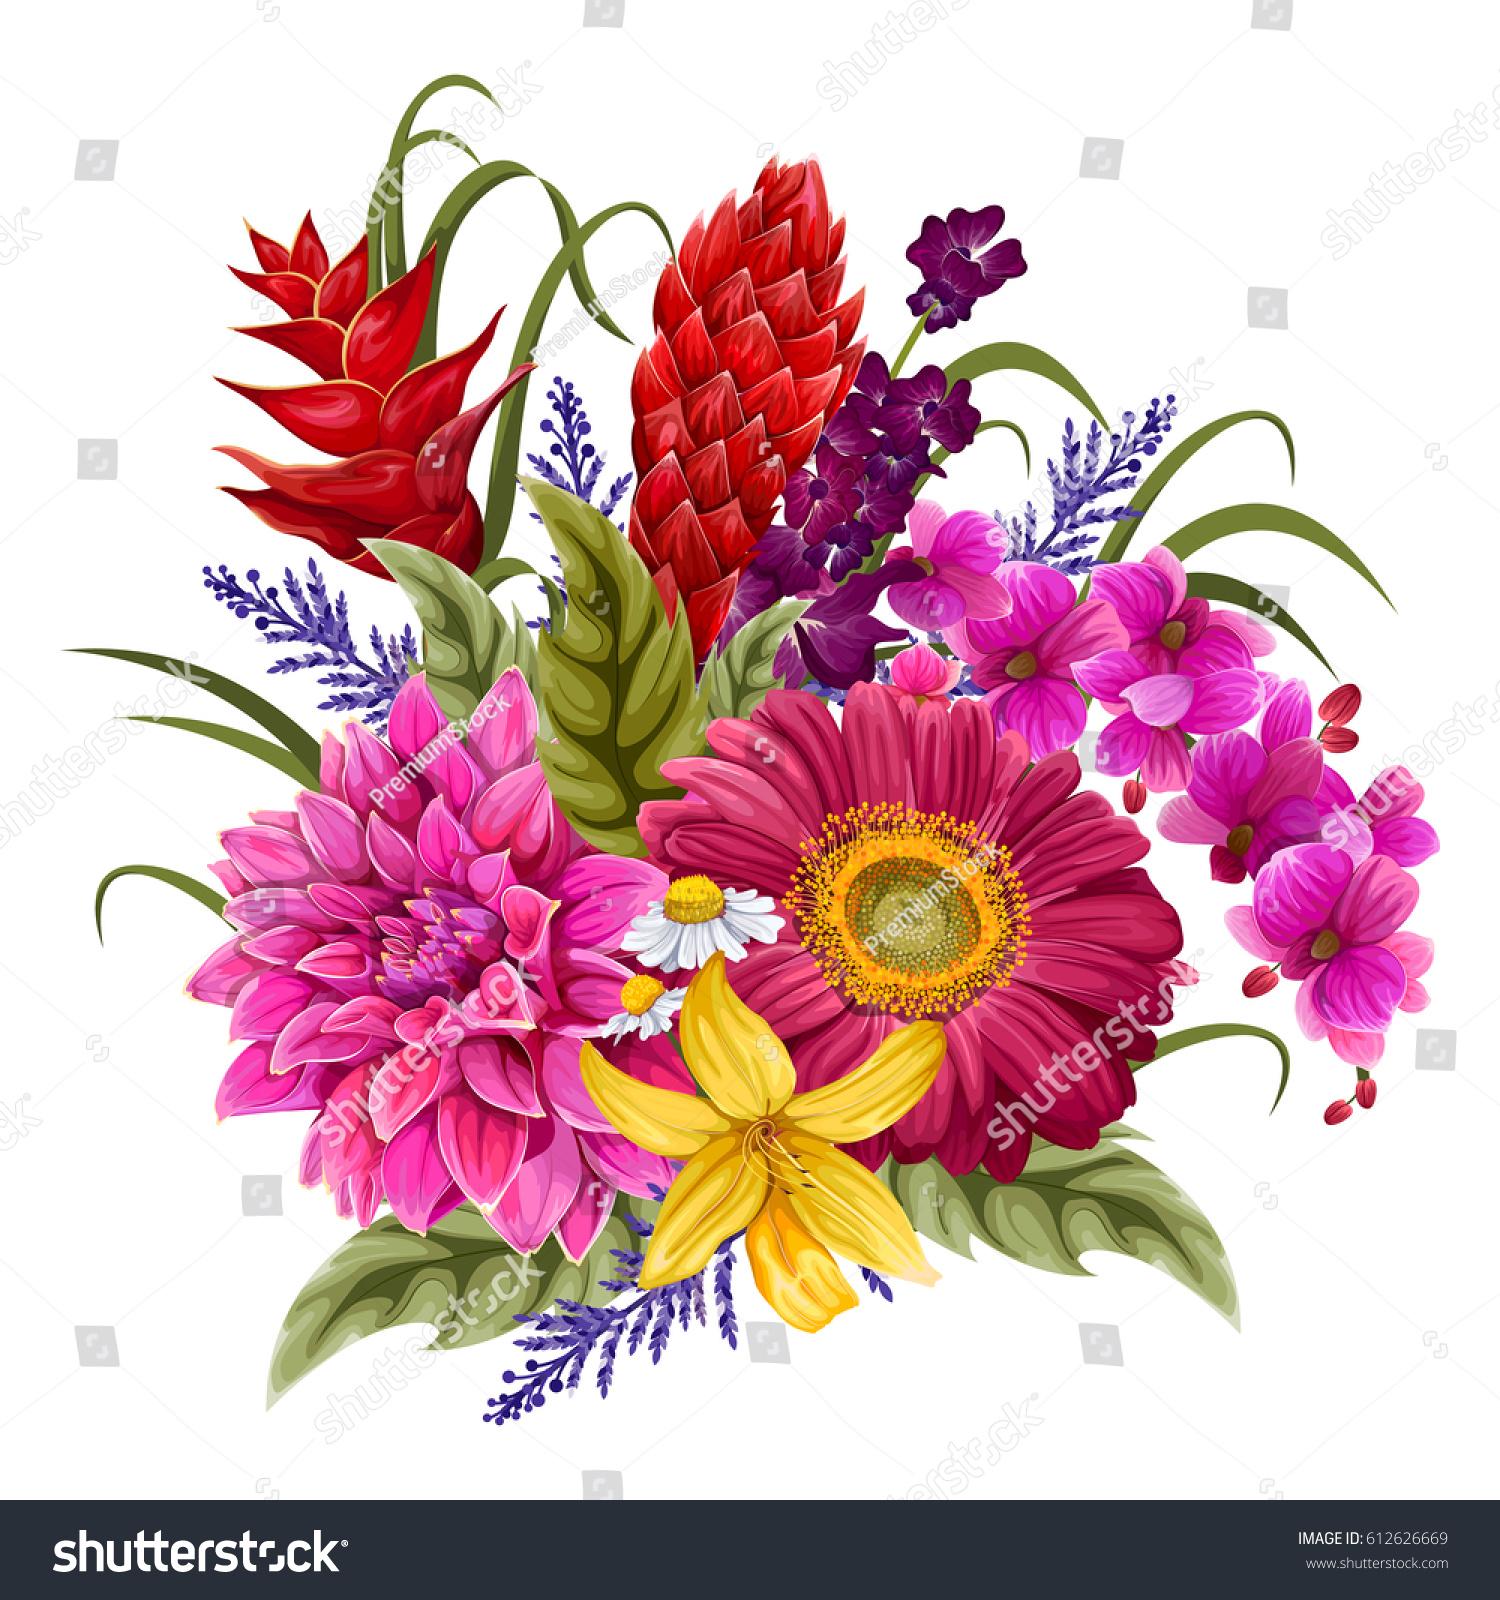 Vector Design Colorful Vintage Flower Bouquet Stock Vector 612626669 ...